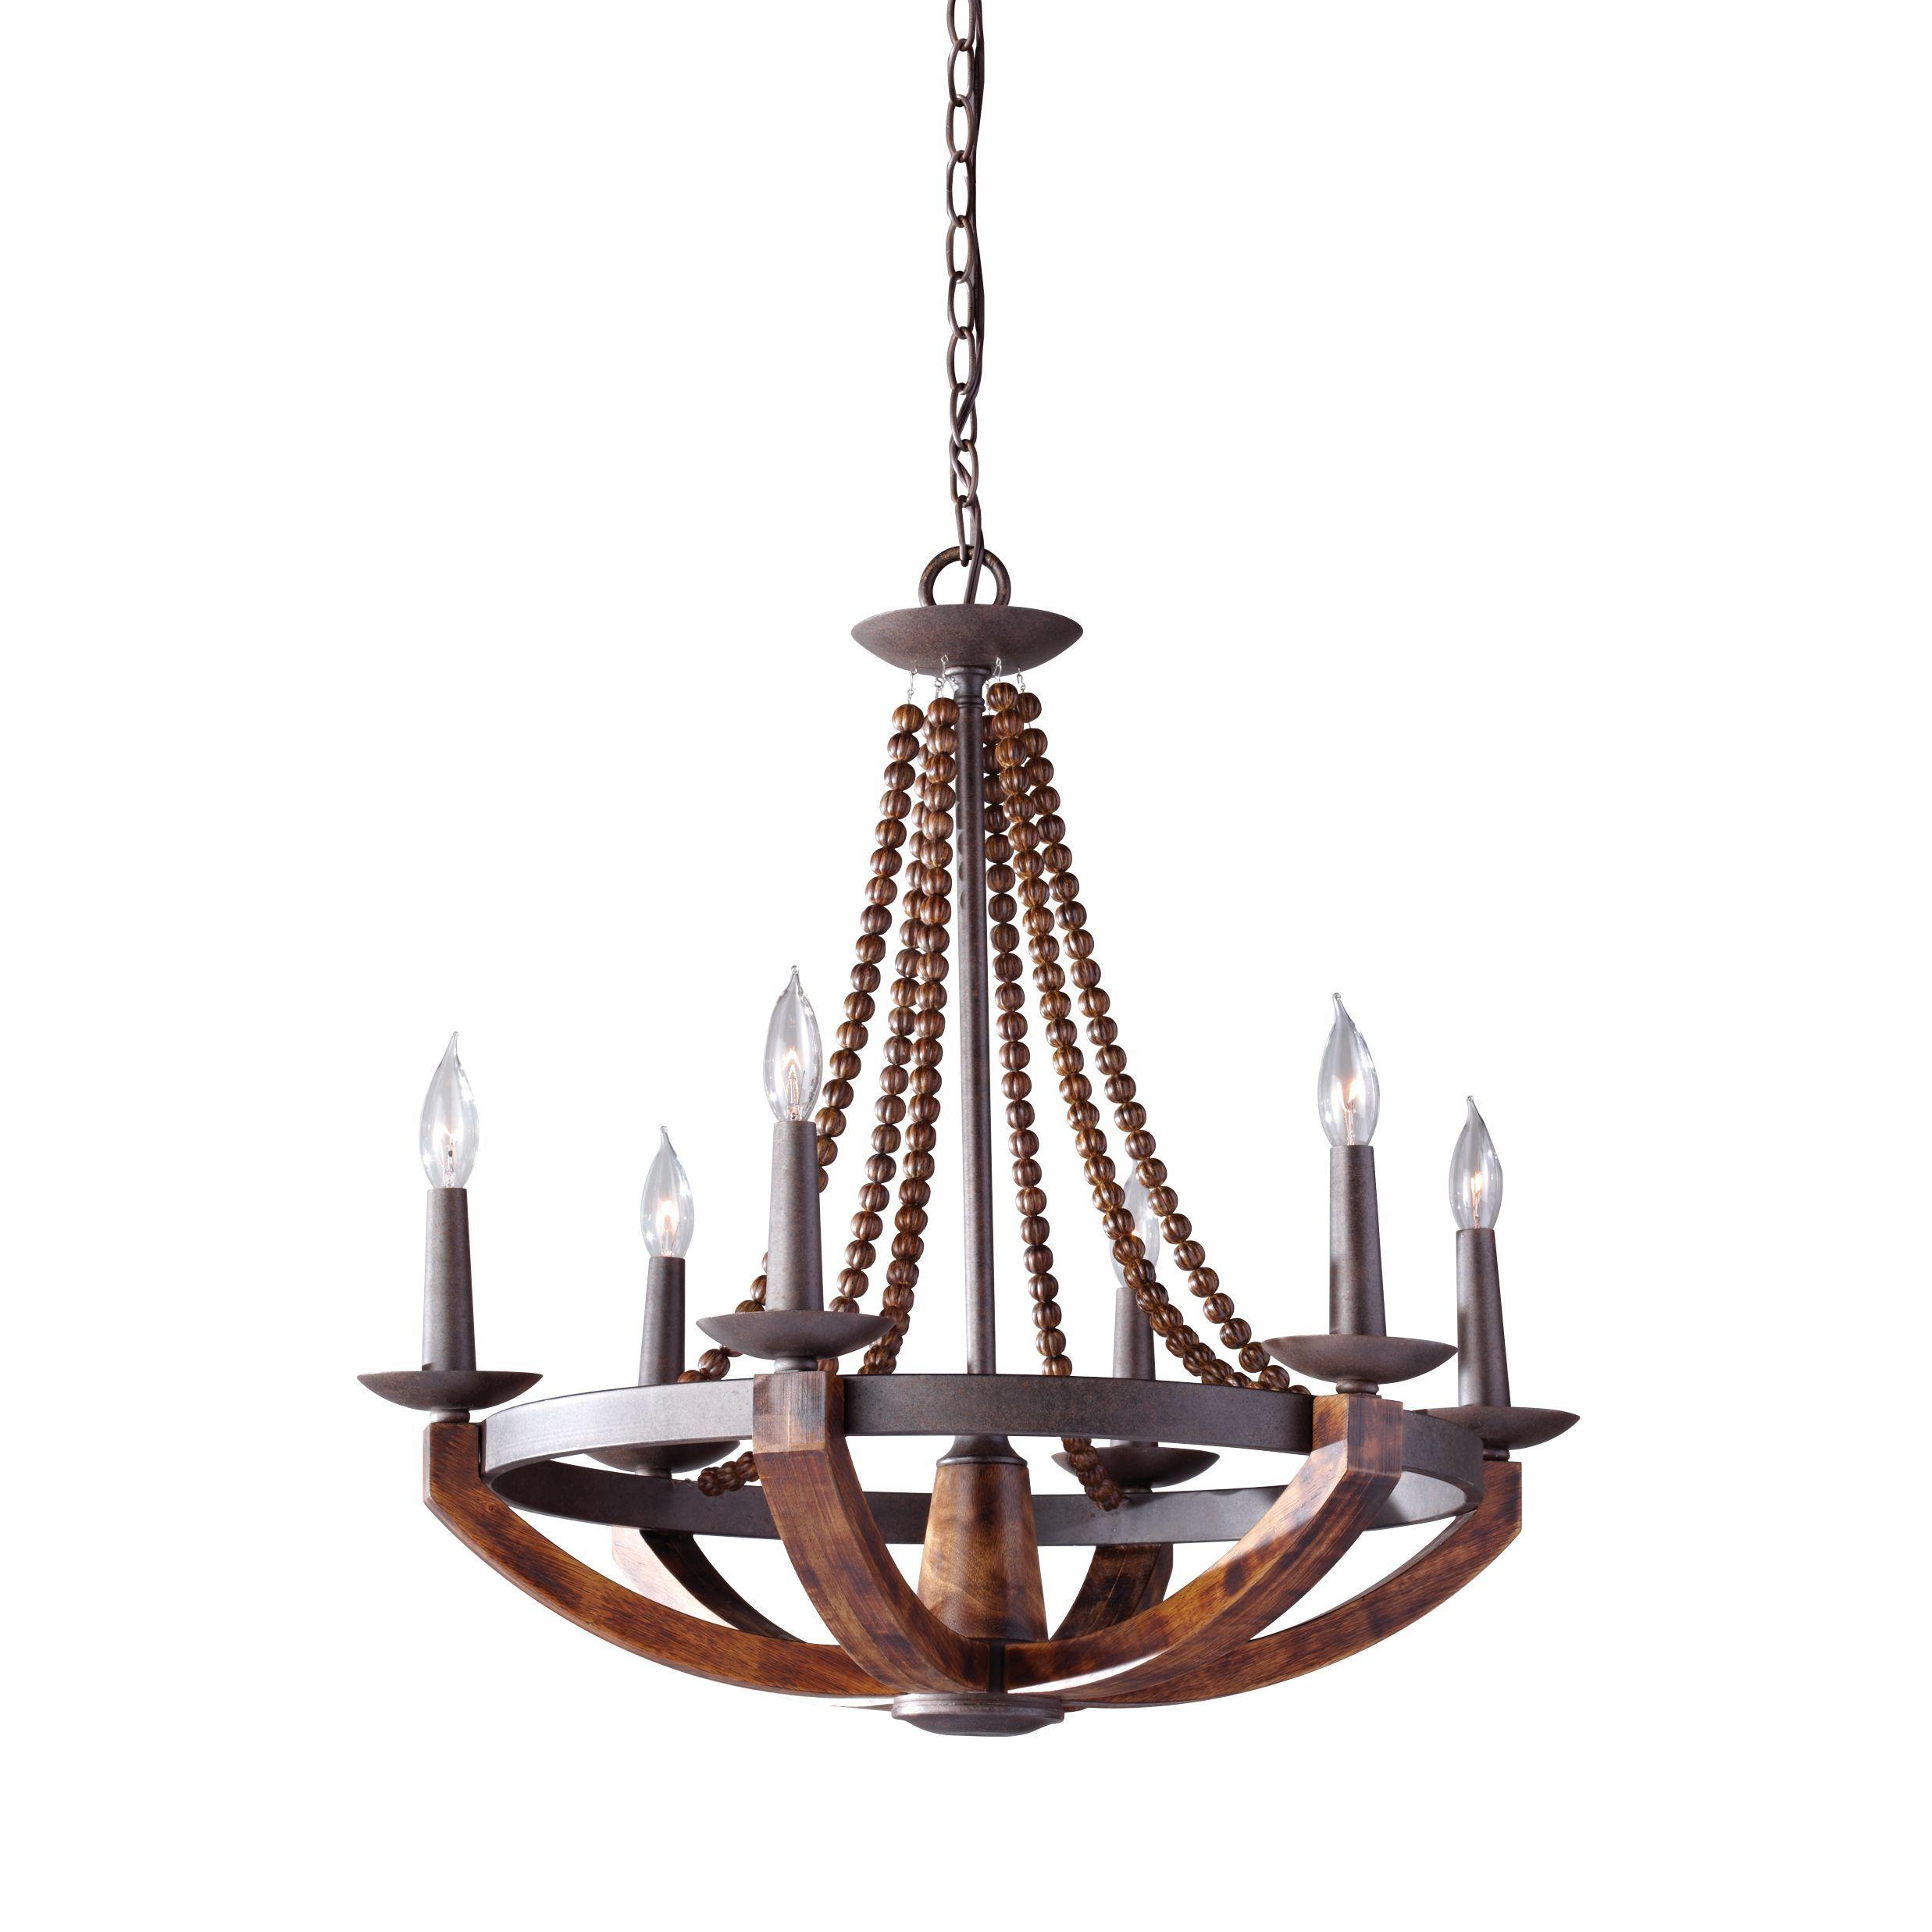 Feiss adan 6 light rustic iron burnished wood chandelier 6 feiss adan 6 light rustic iron burnished wood chandelier 6 light adan arubaitofo Gallery